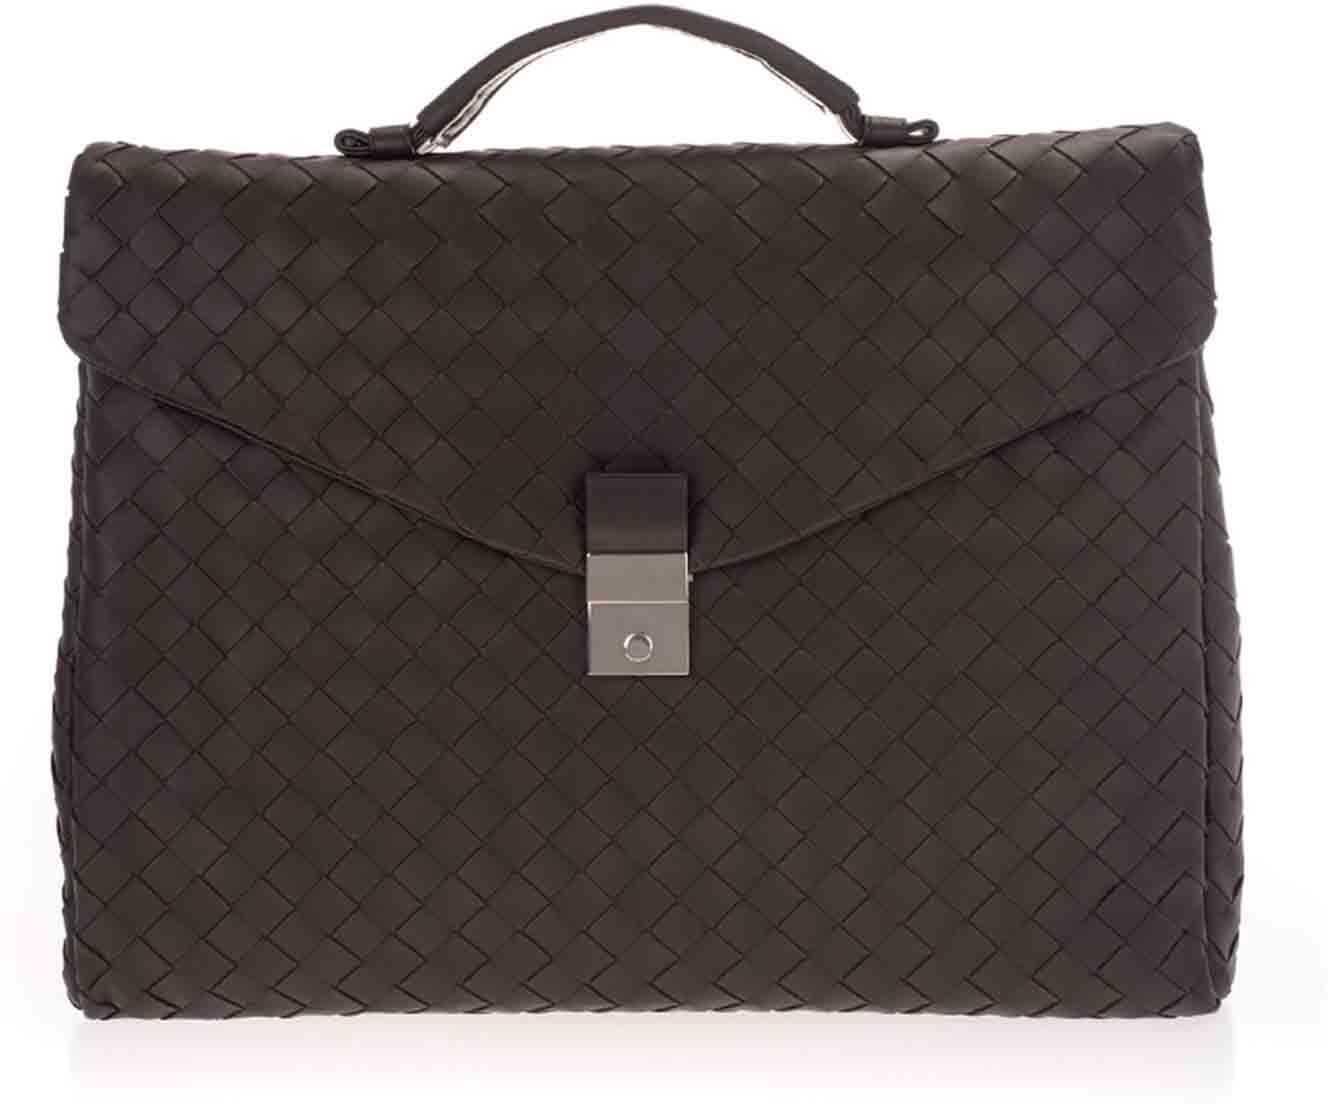 Bottega Veneta Intrecciato Business Bag In Fondente 630239VCRL22135 Brown imagine b-mall.ro